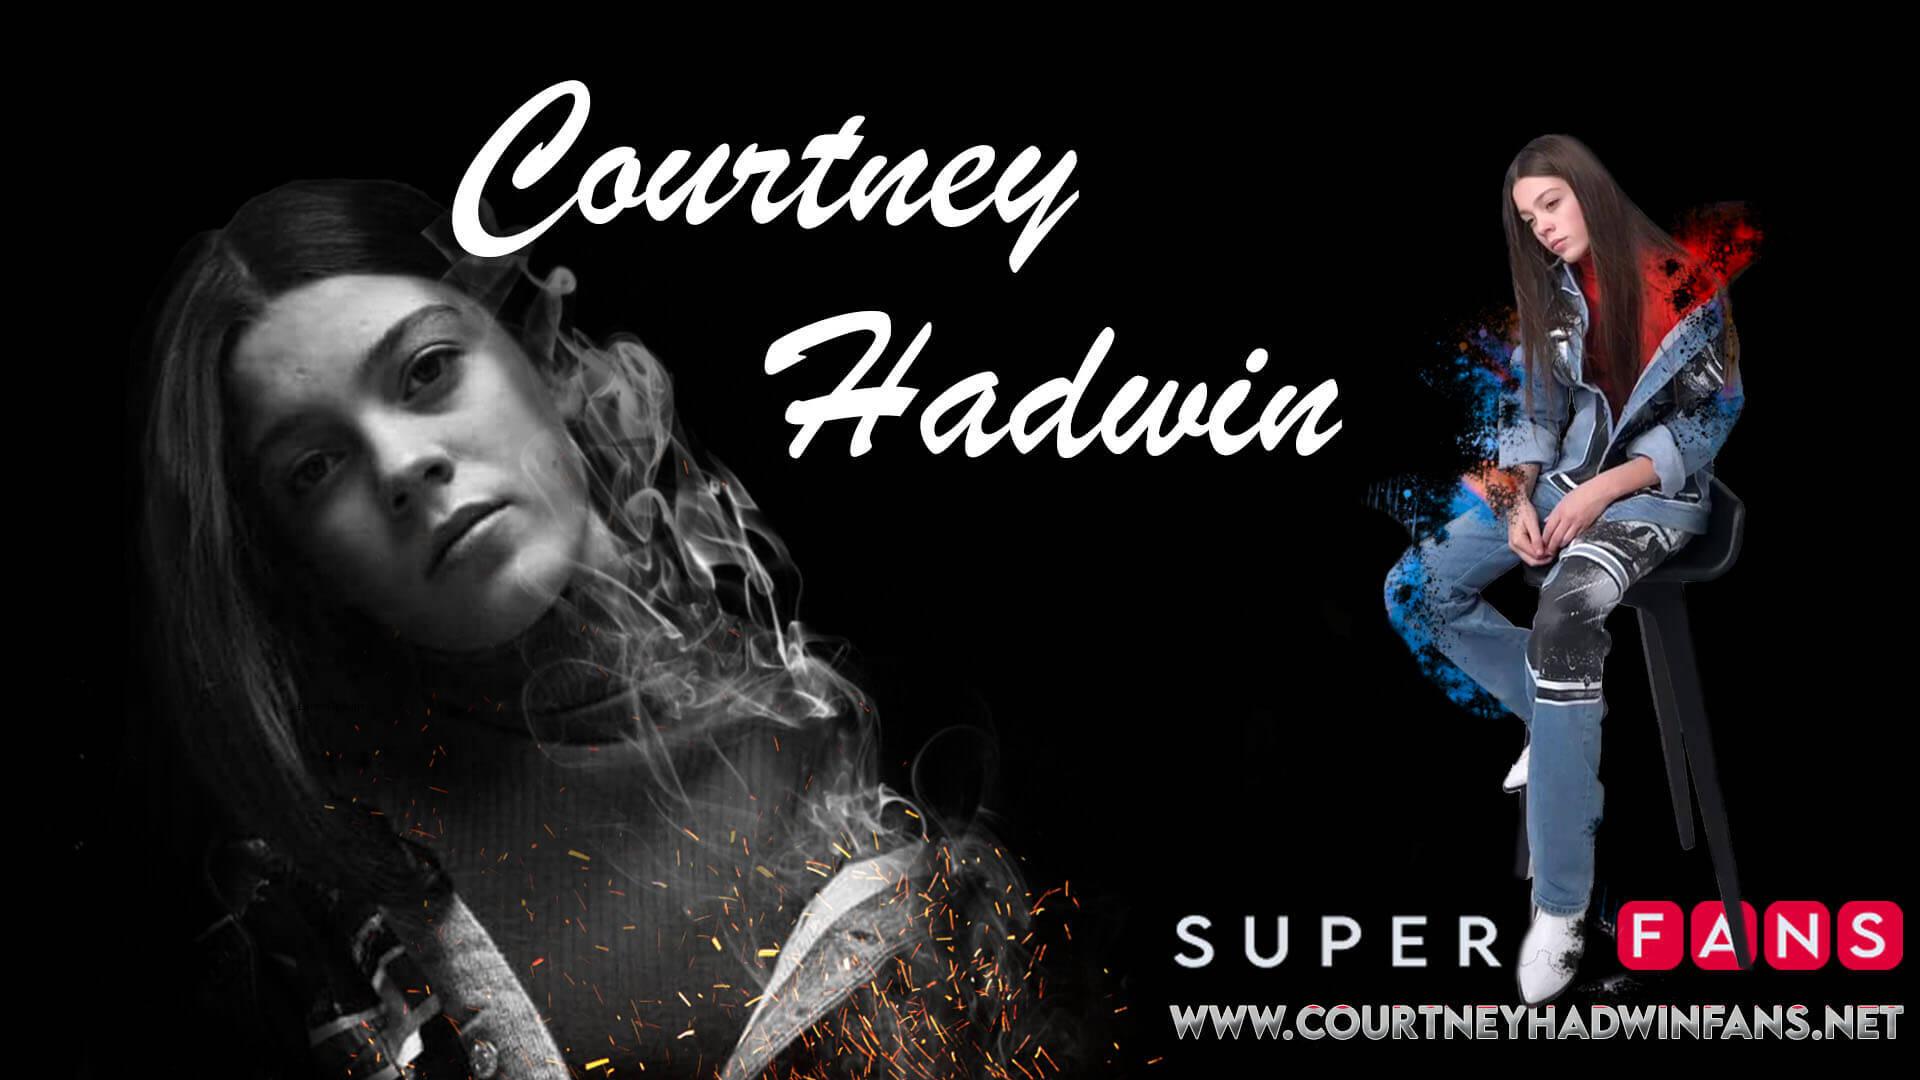 COURTNEY HADWIN FAN CLUB COVER